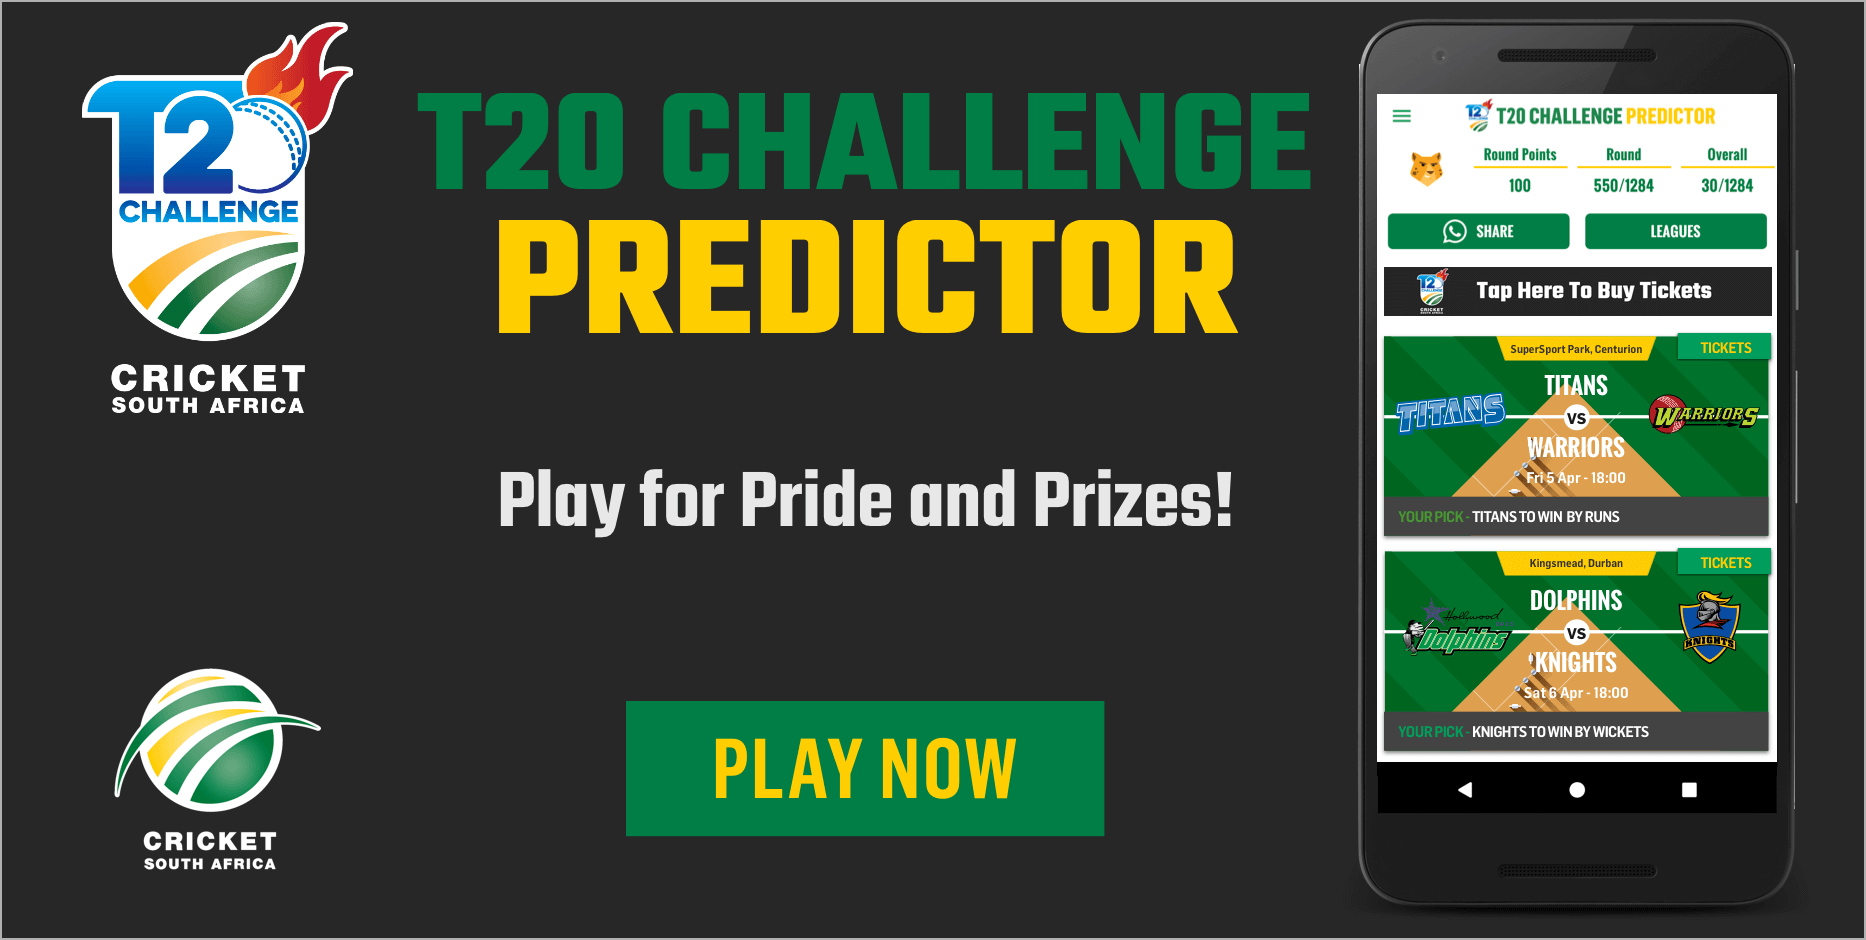 T20 Challenge Predictor